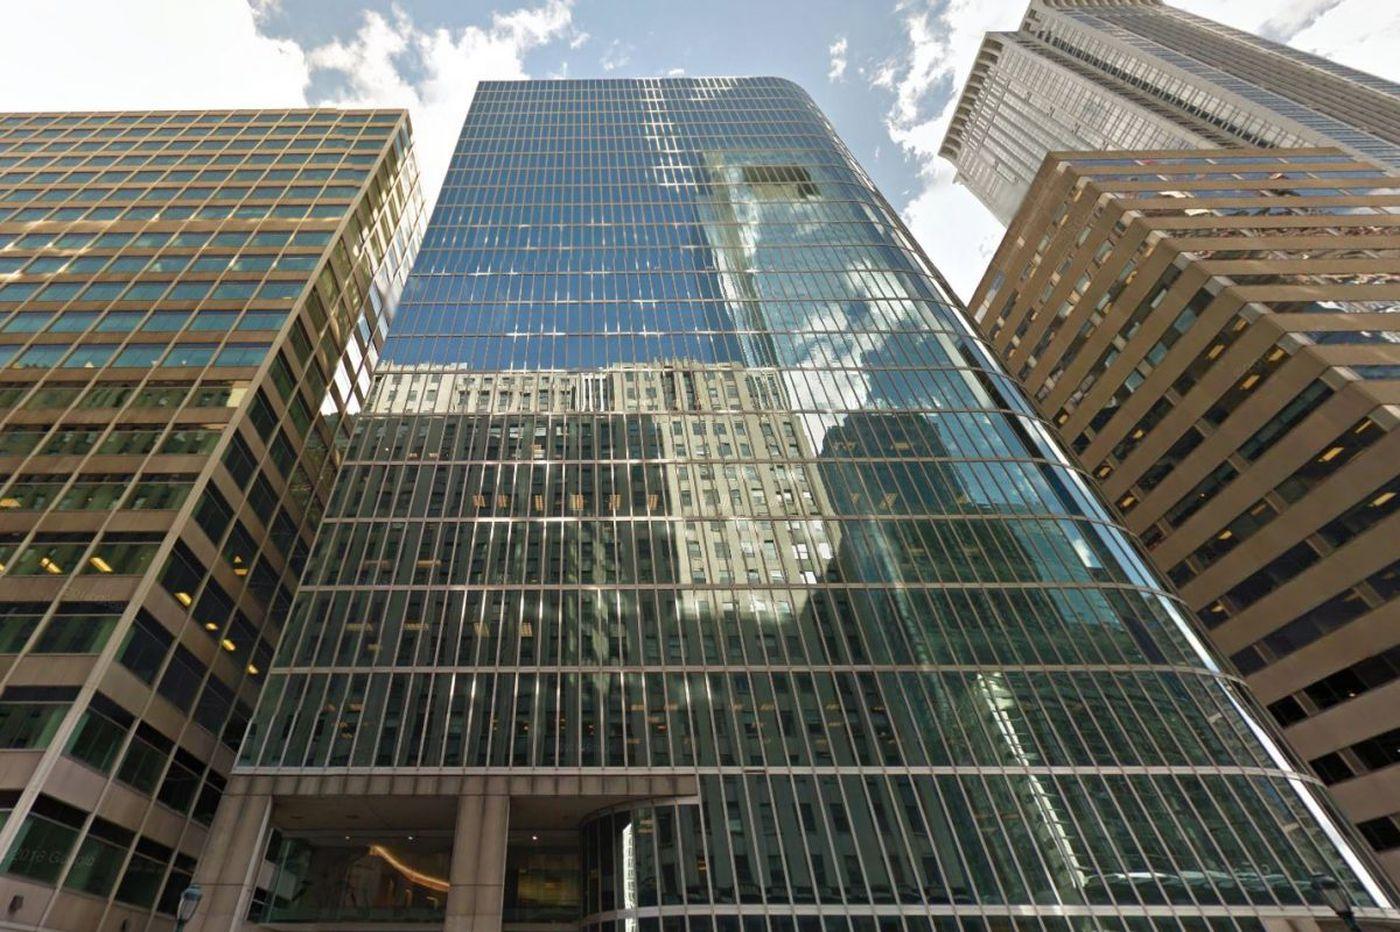 Accenture buys Philly's IBB, helped Comcast, Verizon go digital